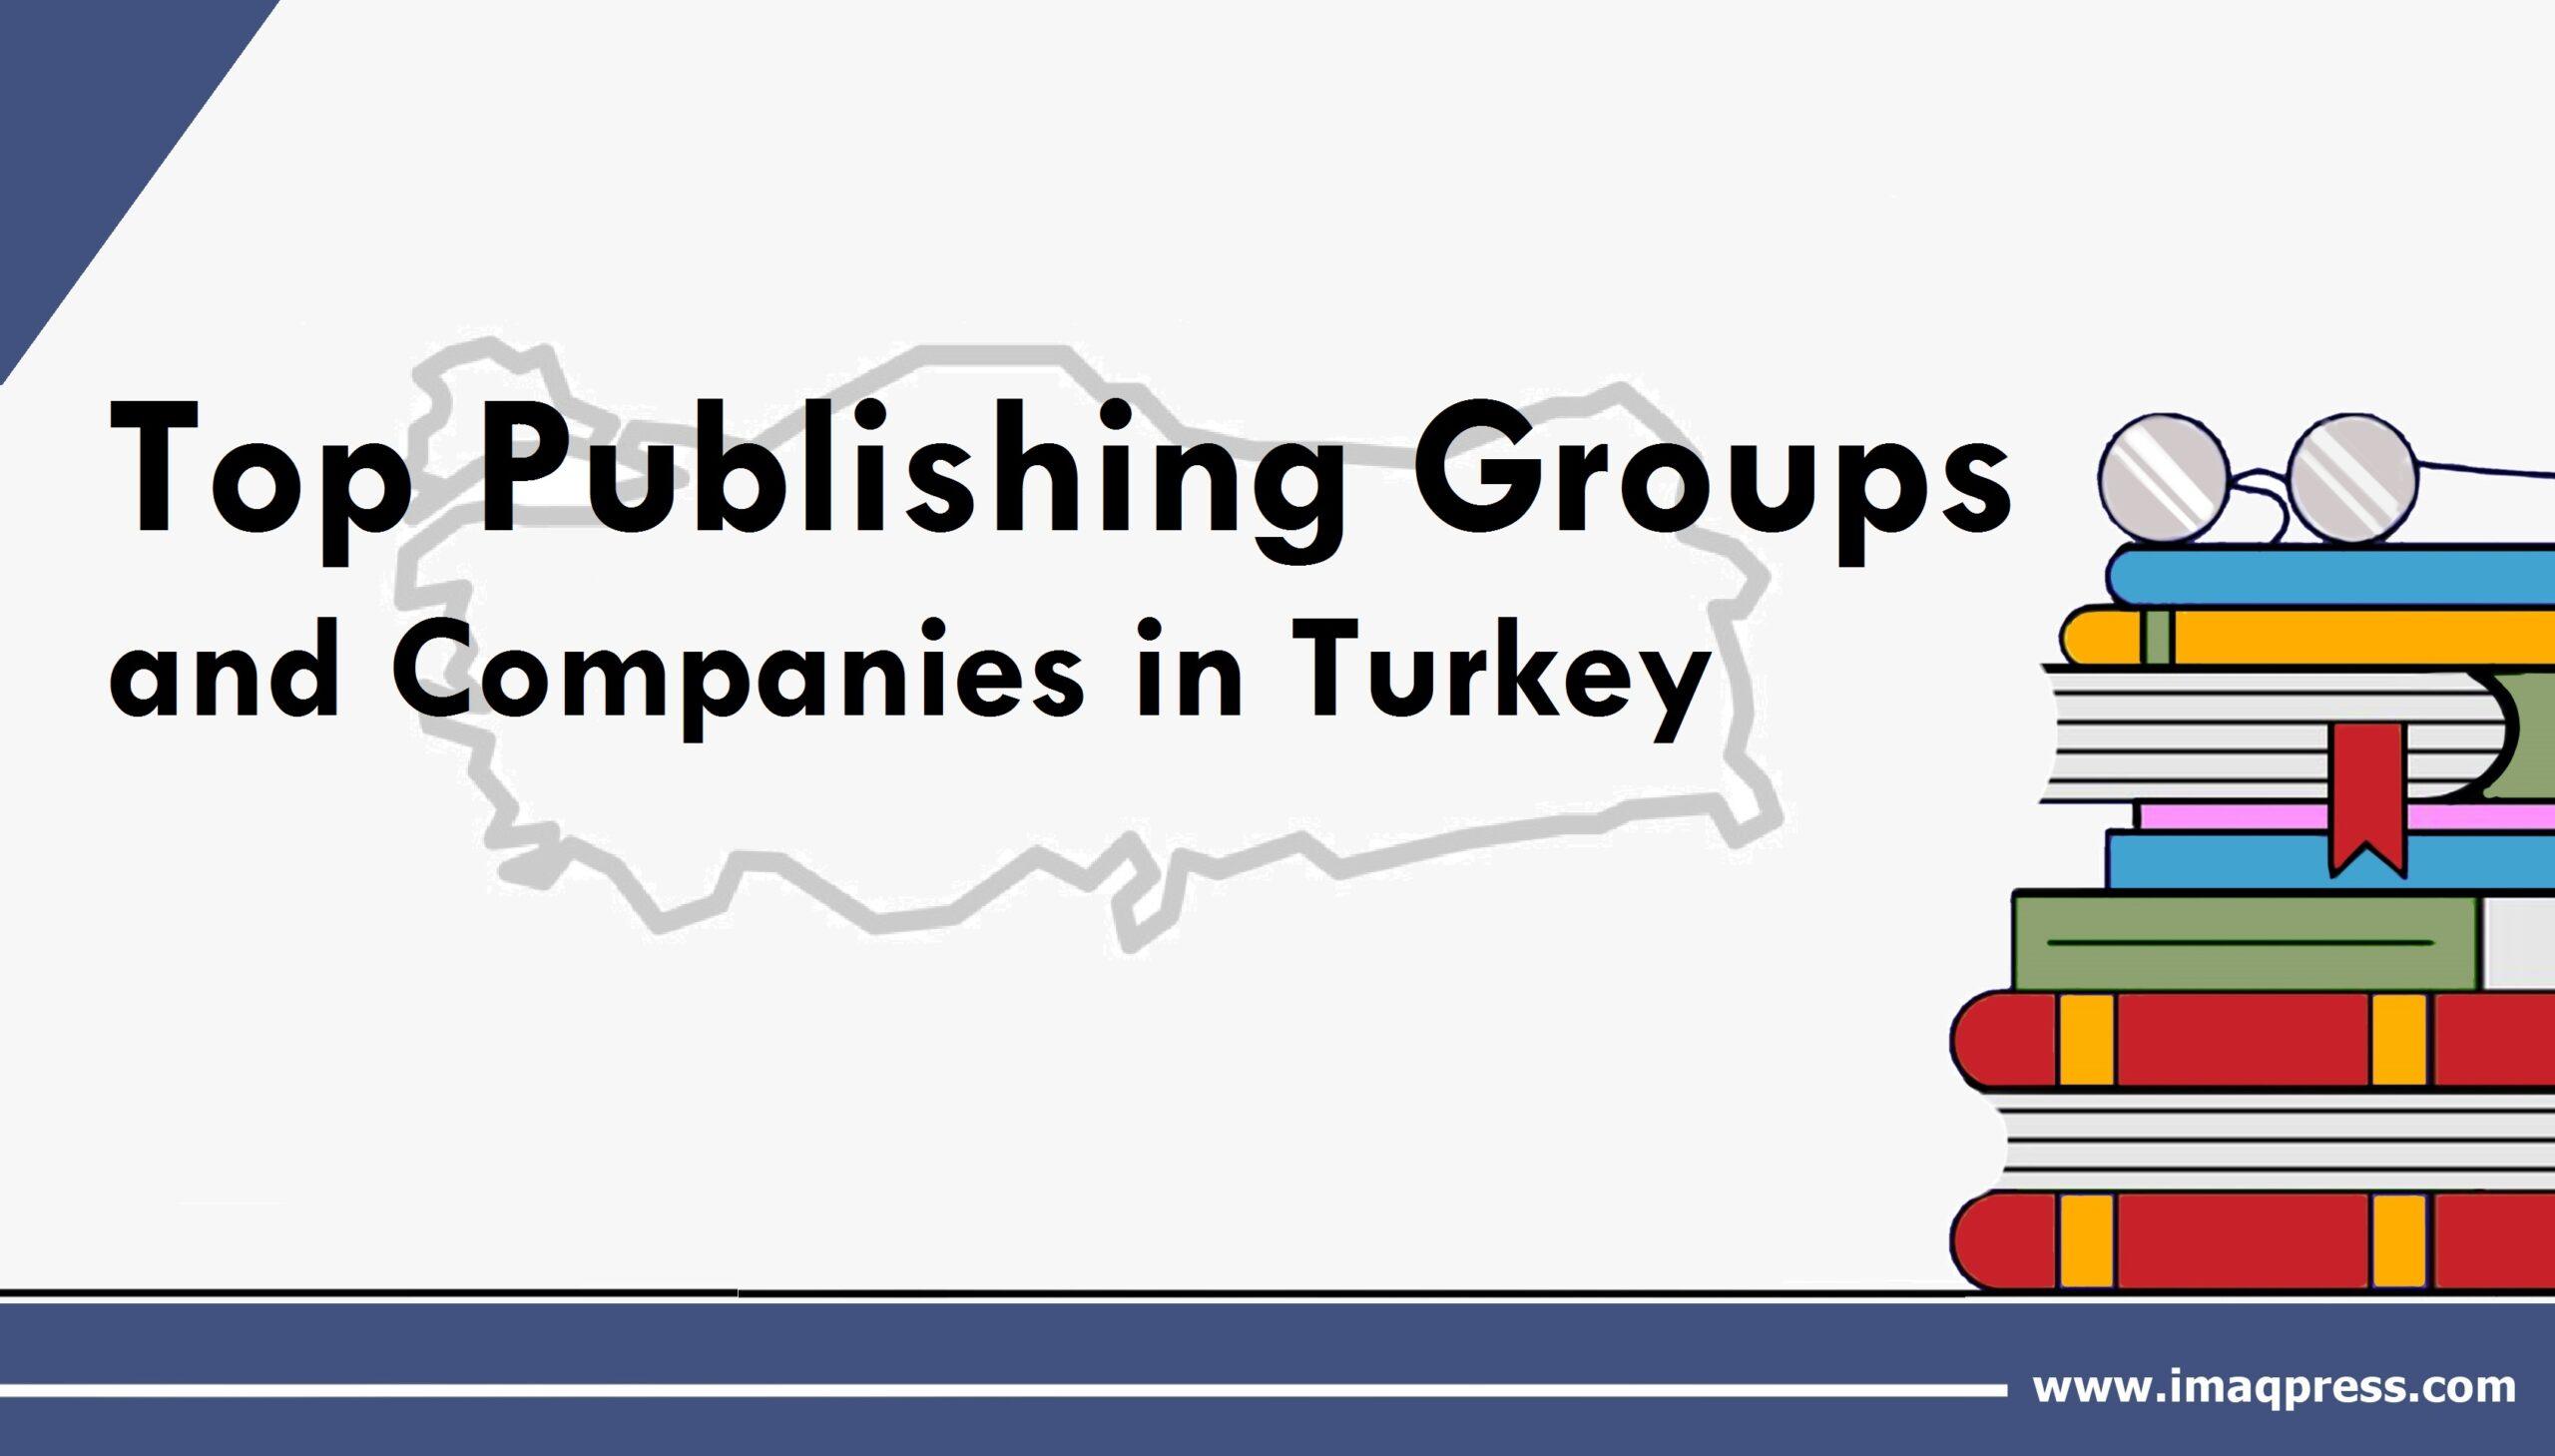 Companies in Turkey